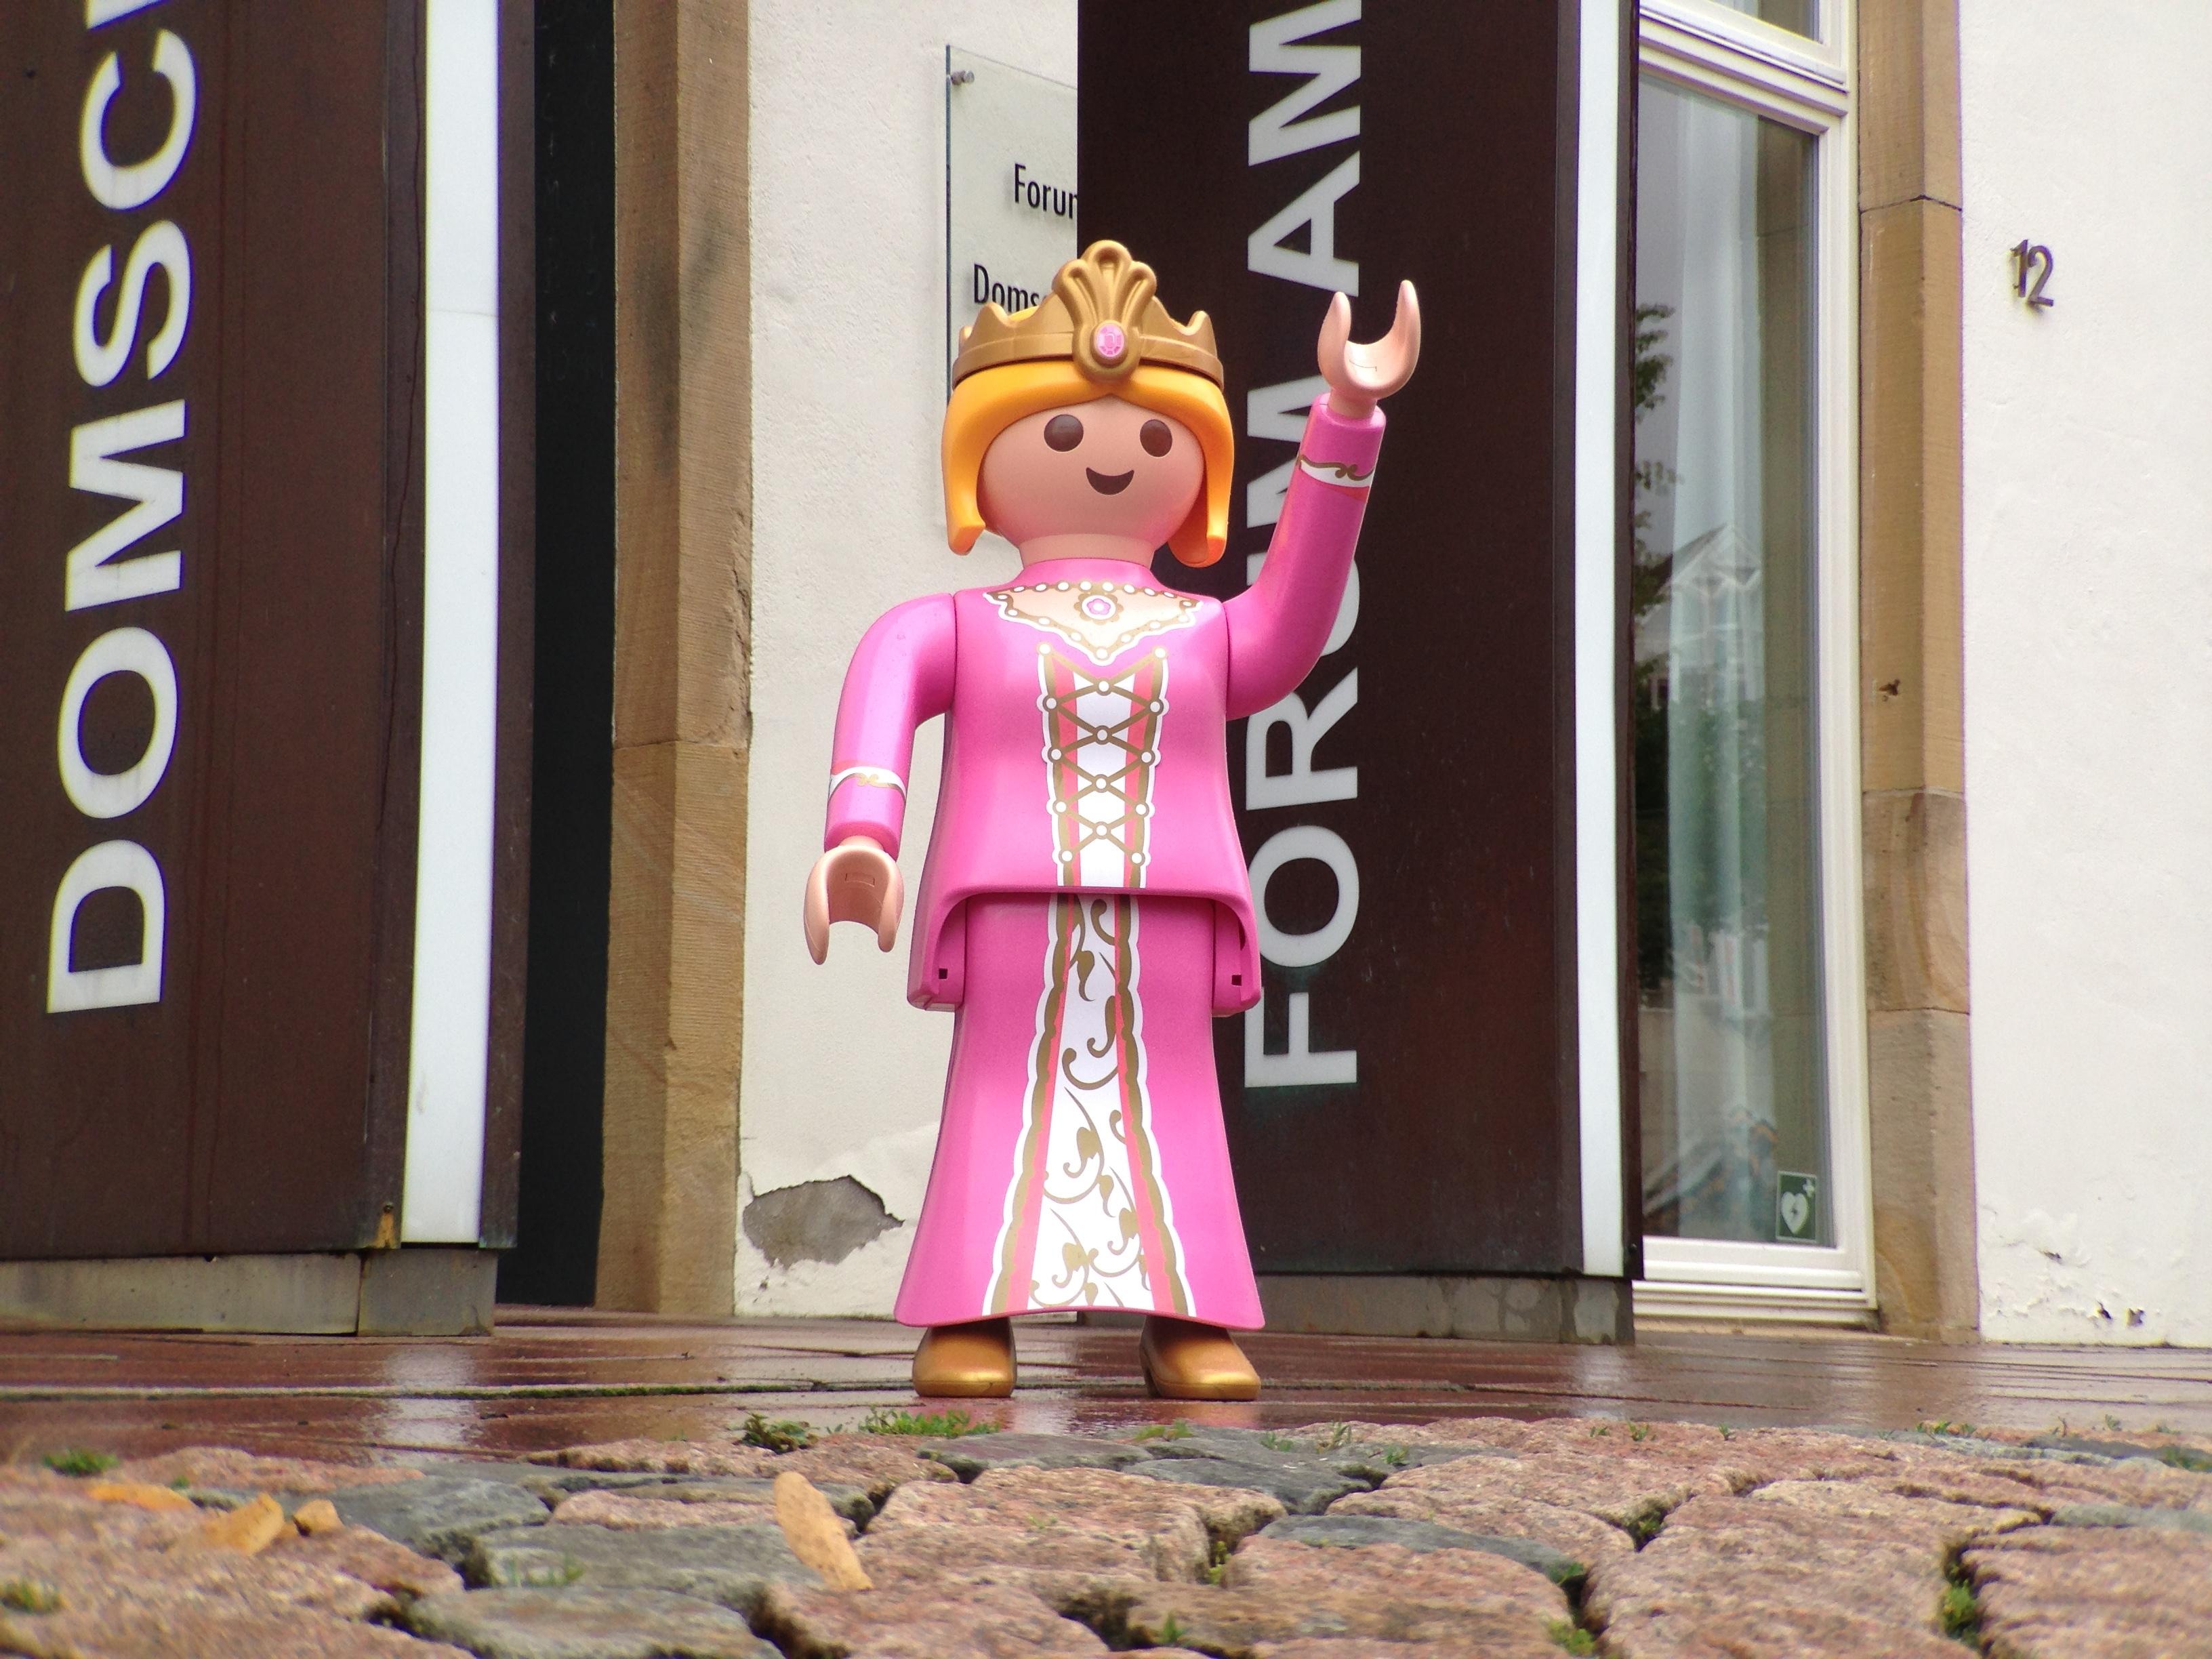 Playmobilfigur vor dem Diözesanmuseum